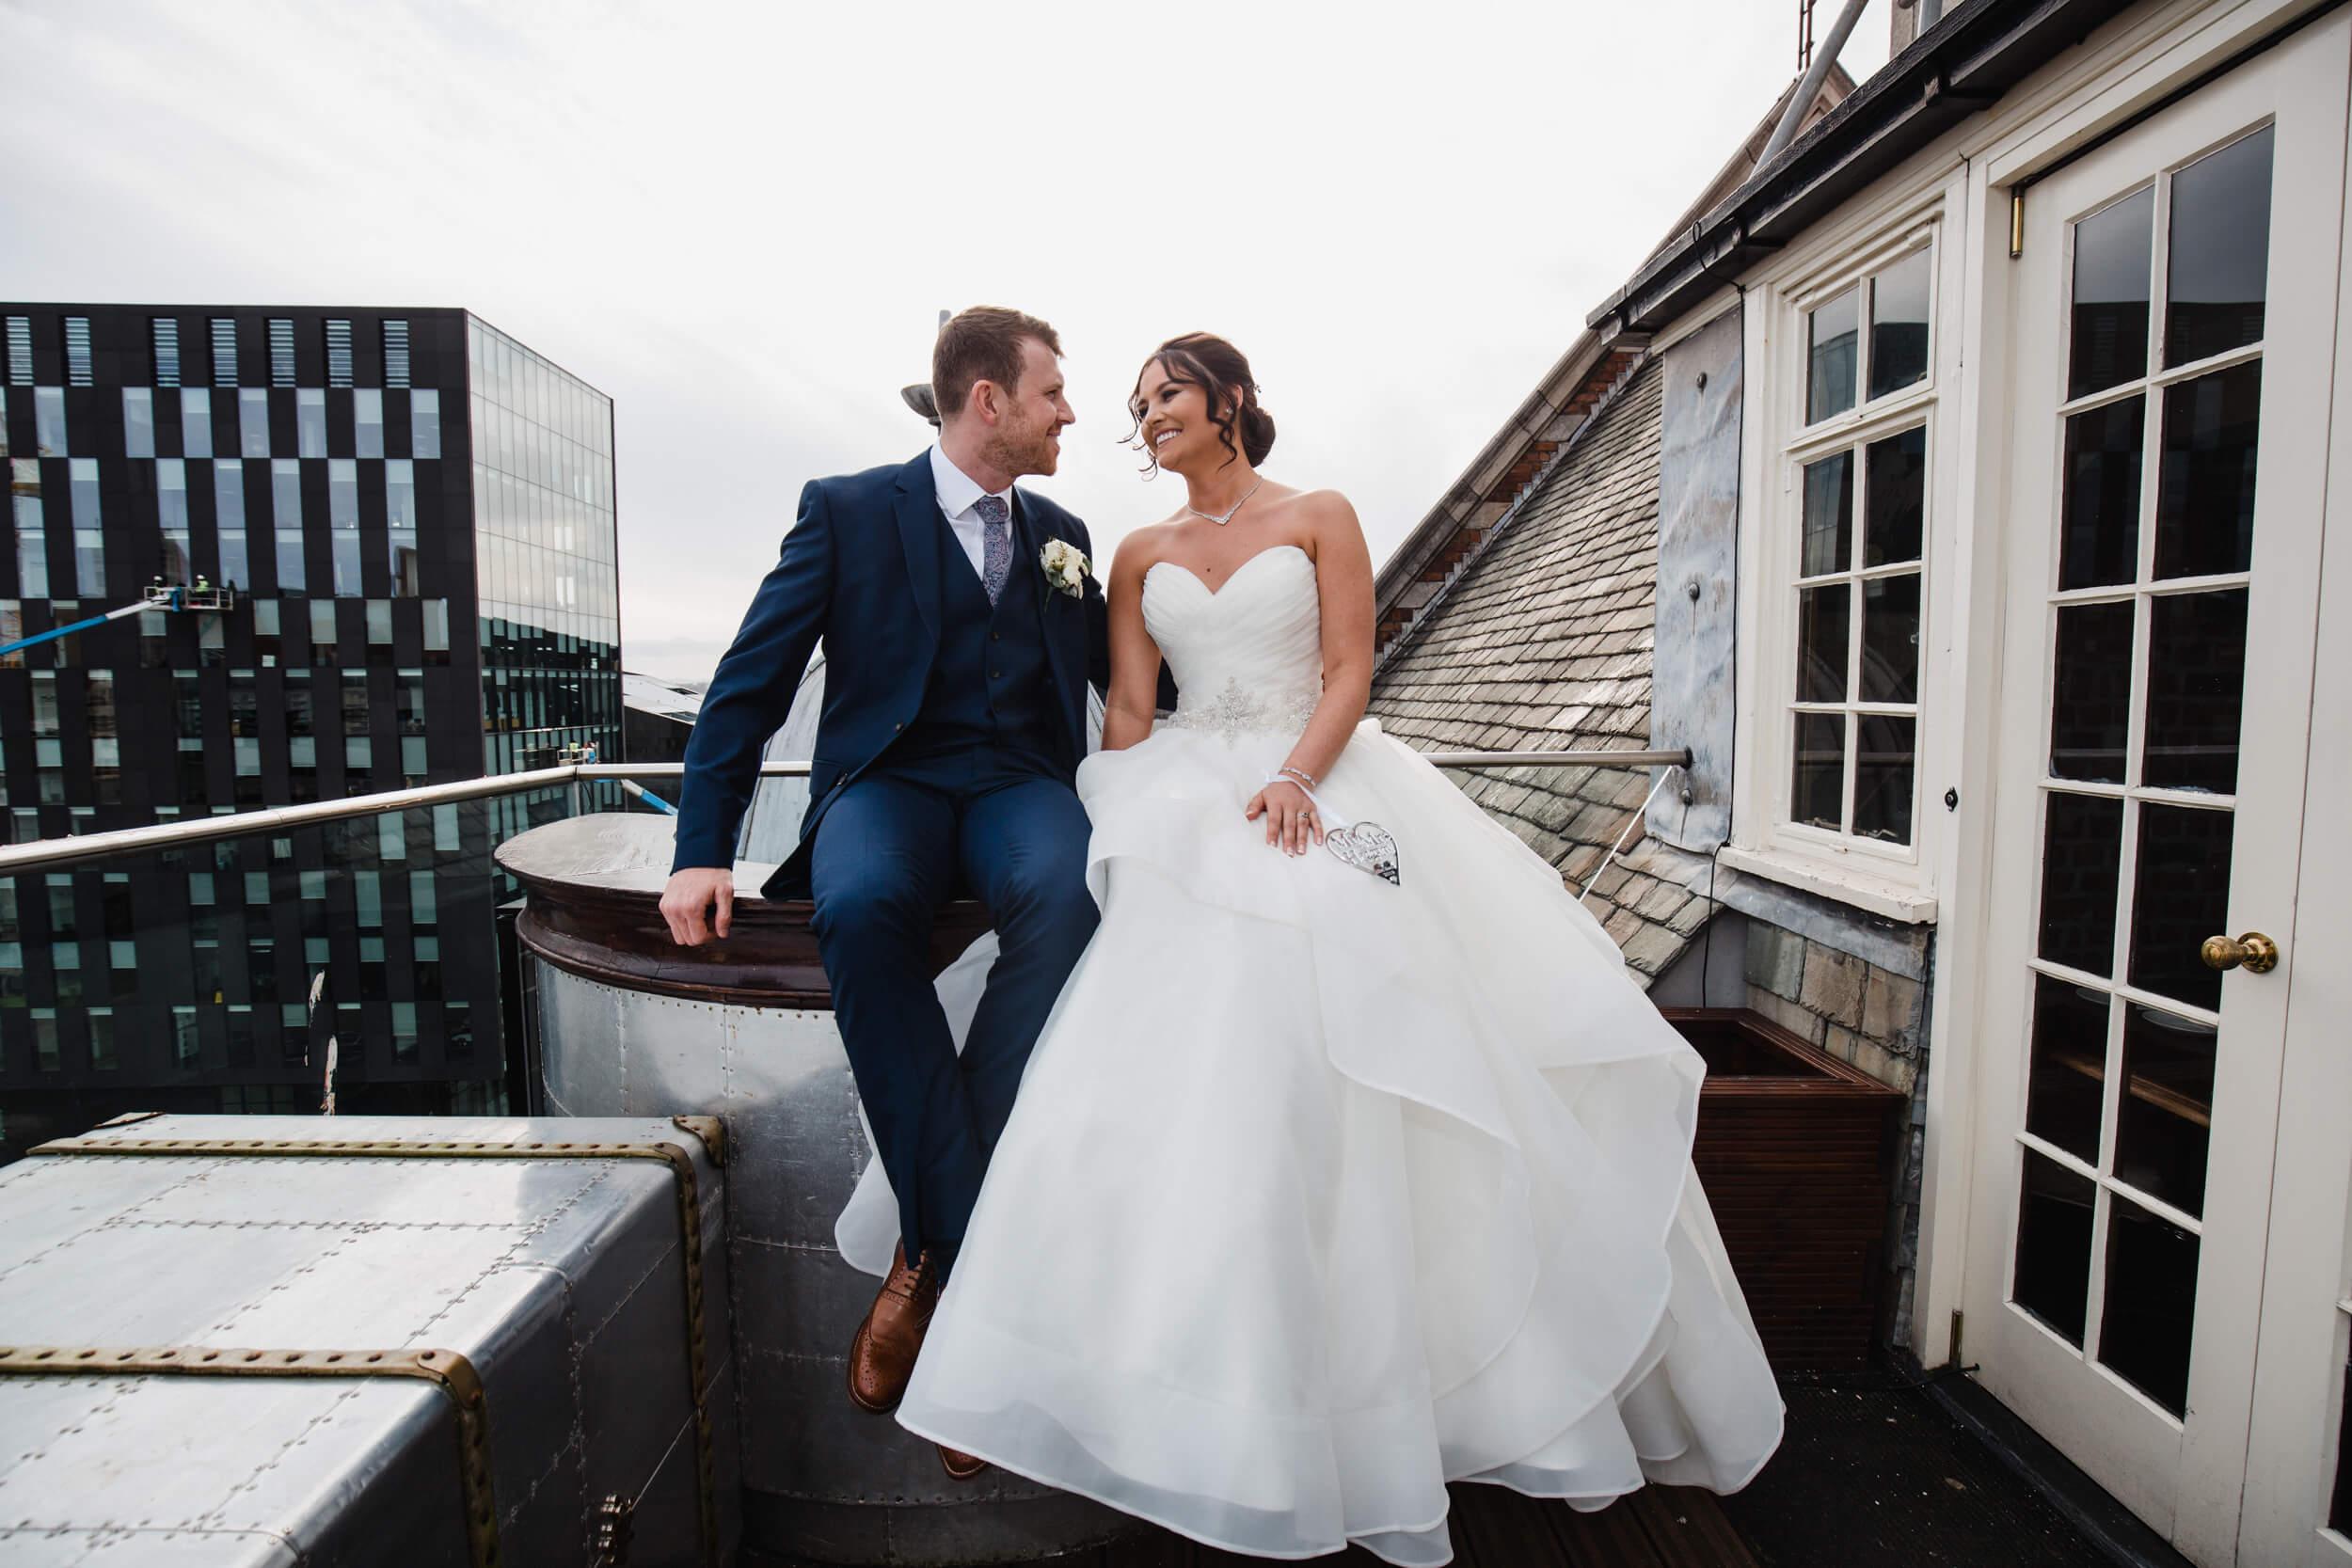 30_James_Street_Hotel_Wedding_Venue_034.jpg